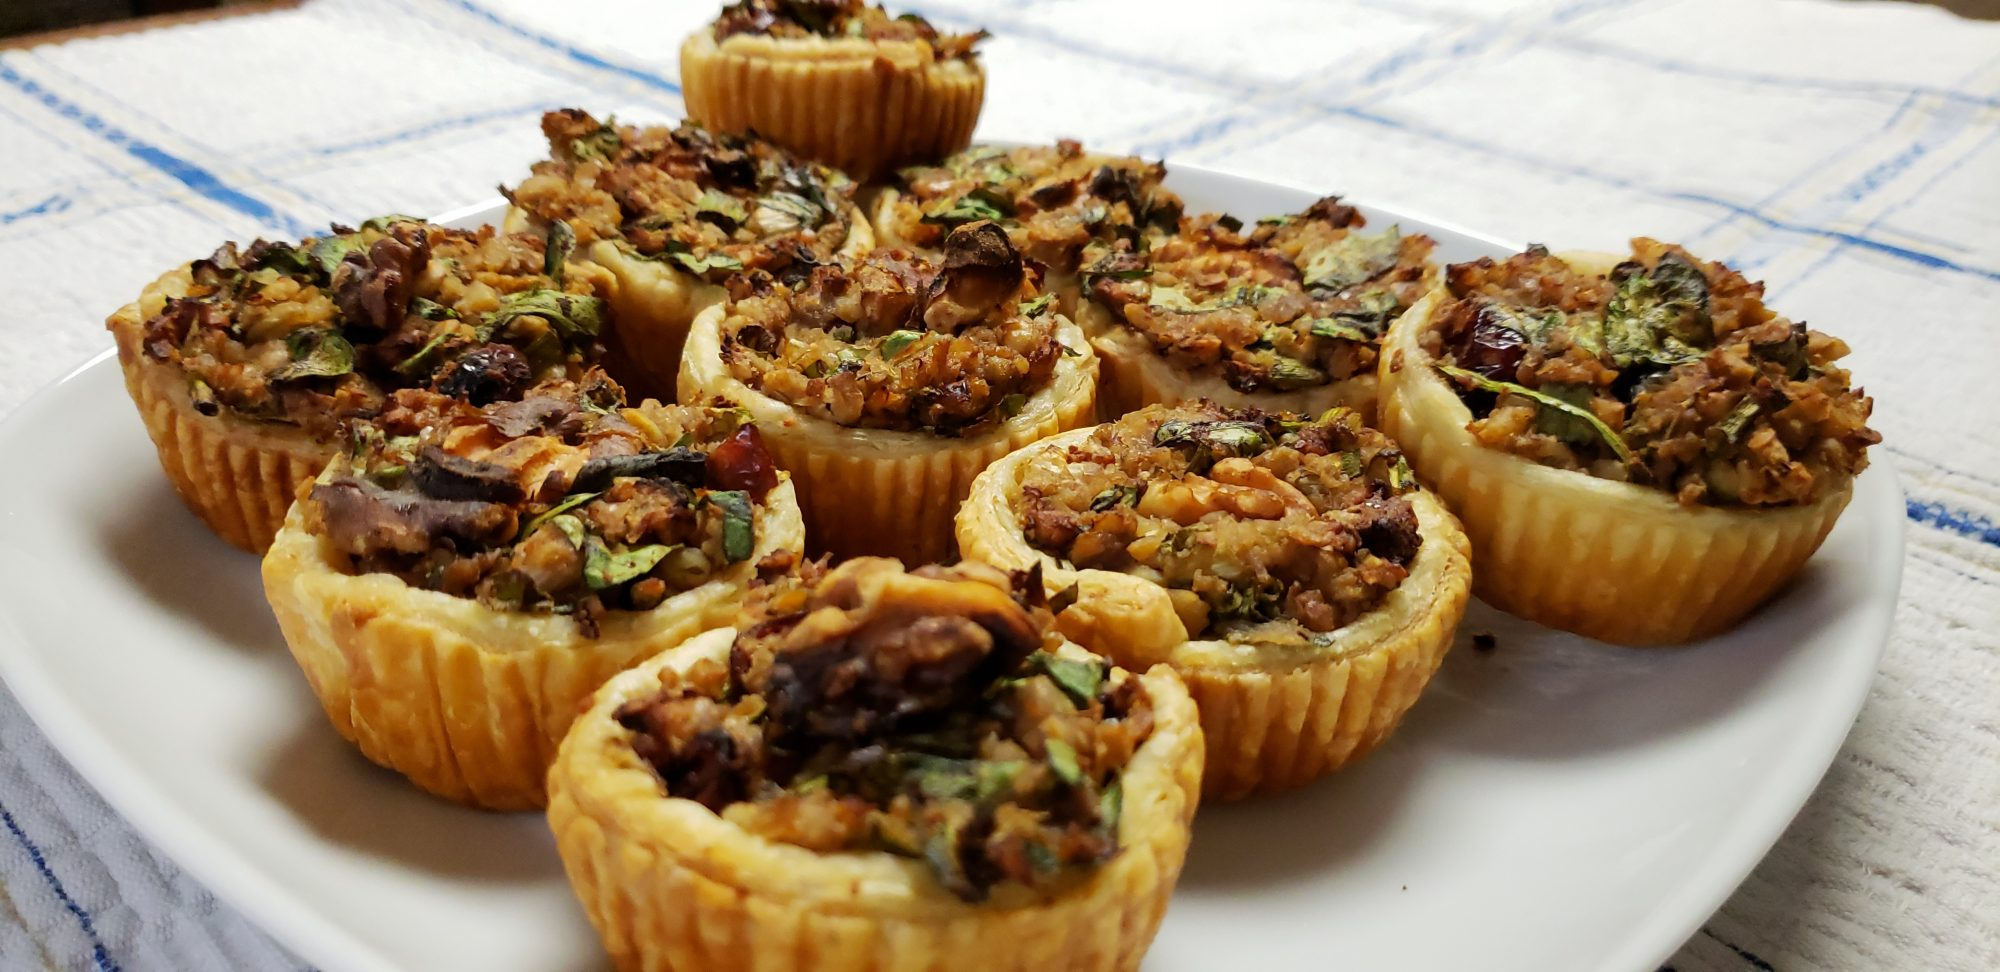 Savory vegan mini tarts with green onions